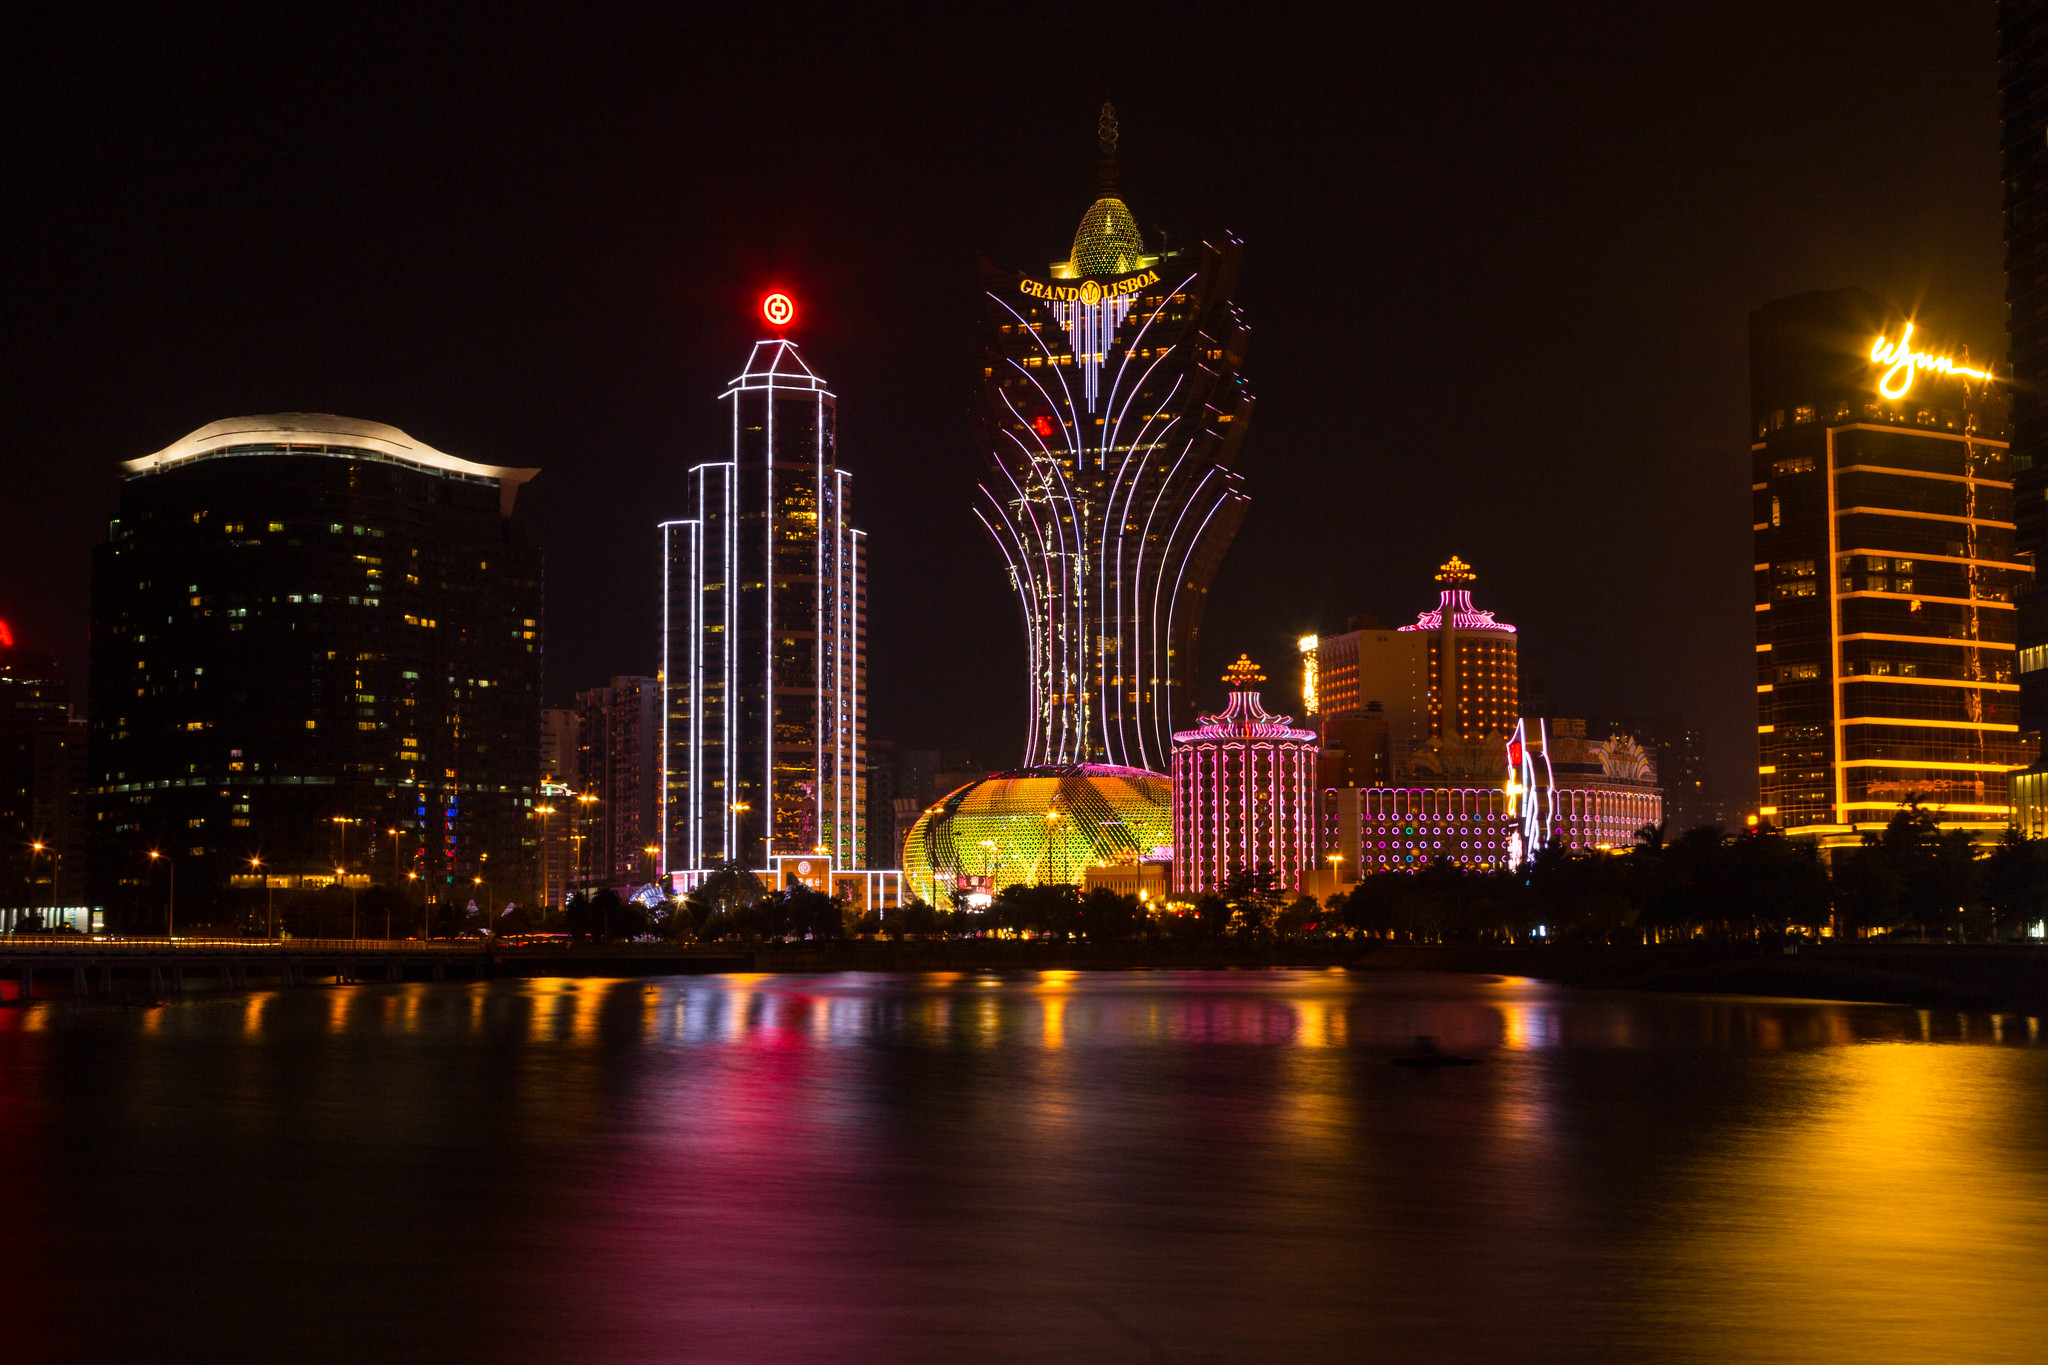 Grand Casino Lisboa, Wynn Casino. Skyline bei Nacht, Macau